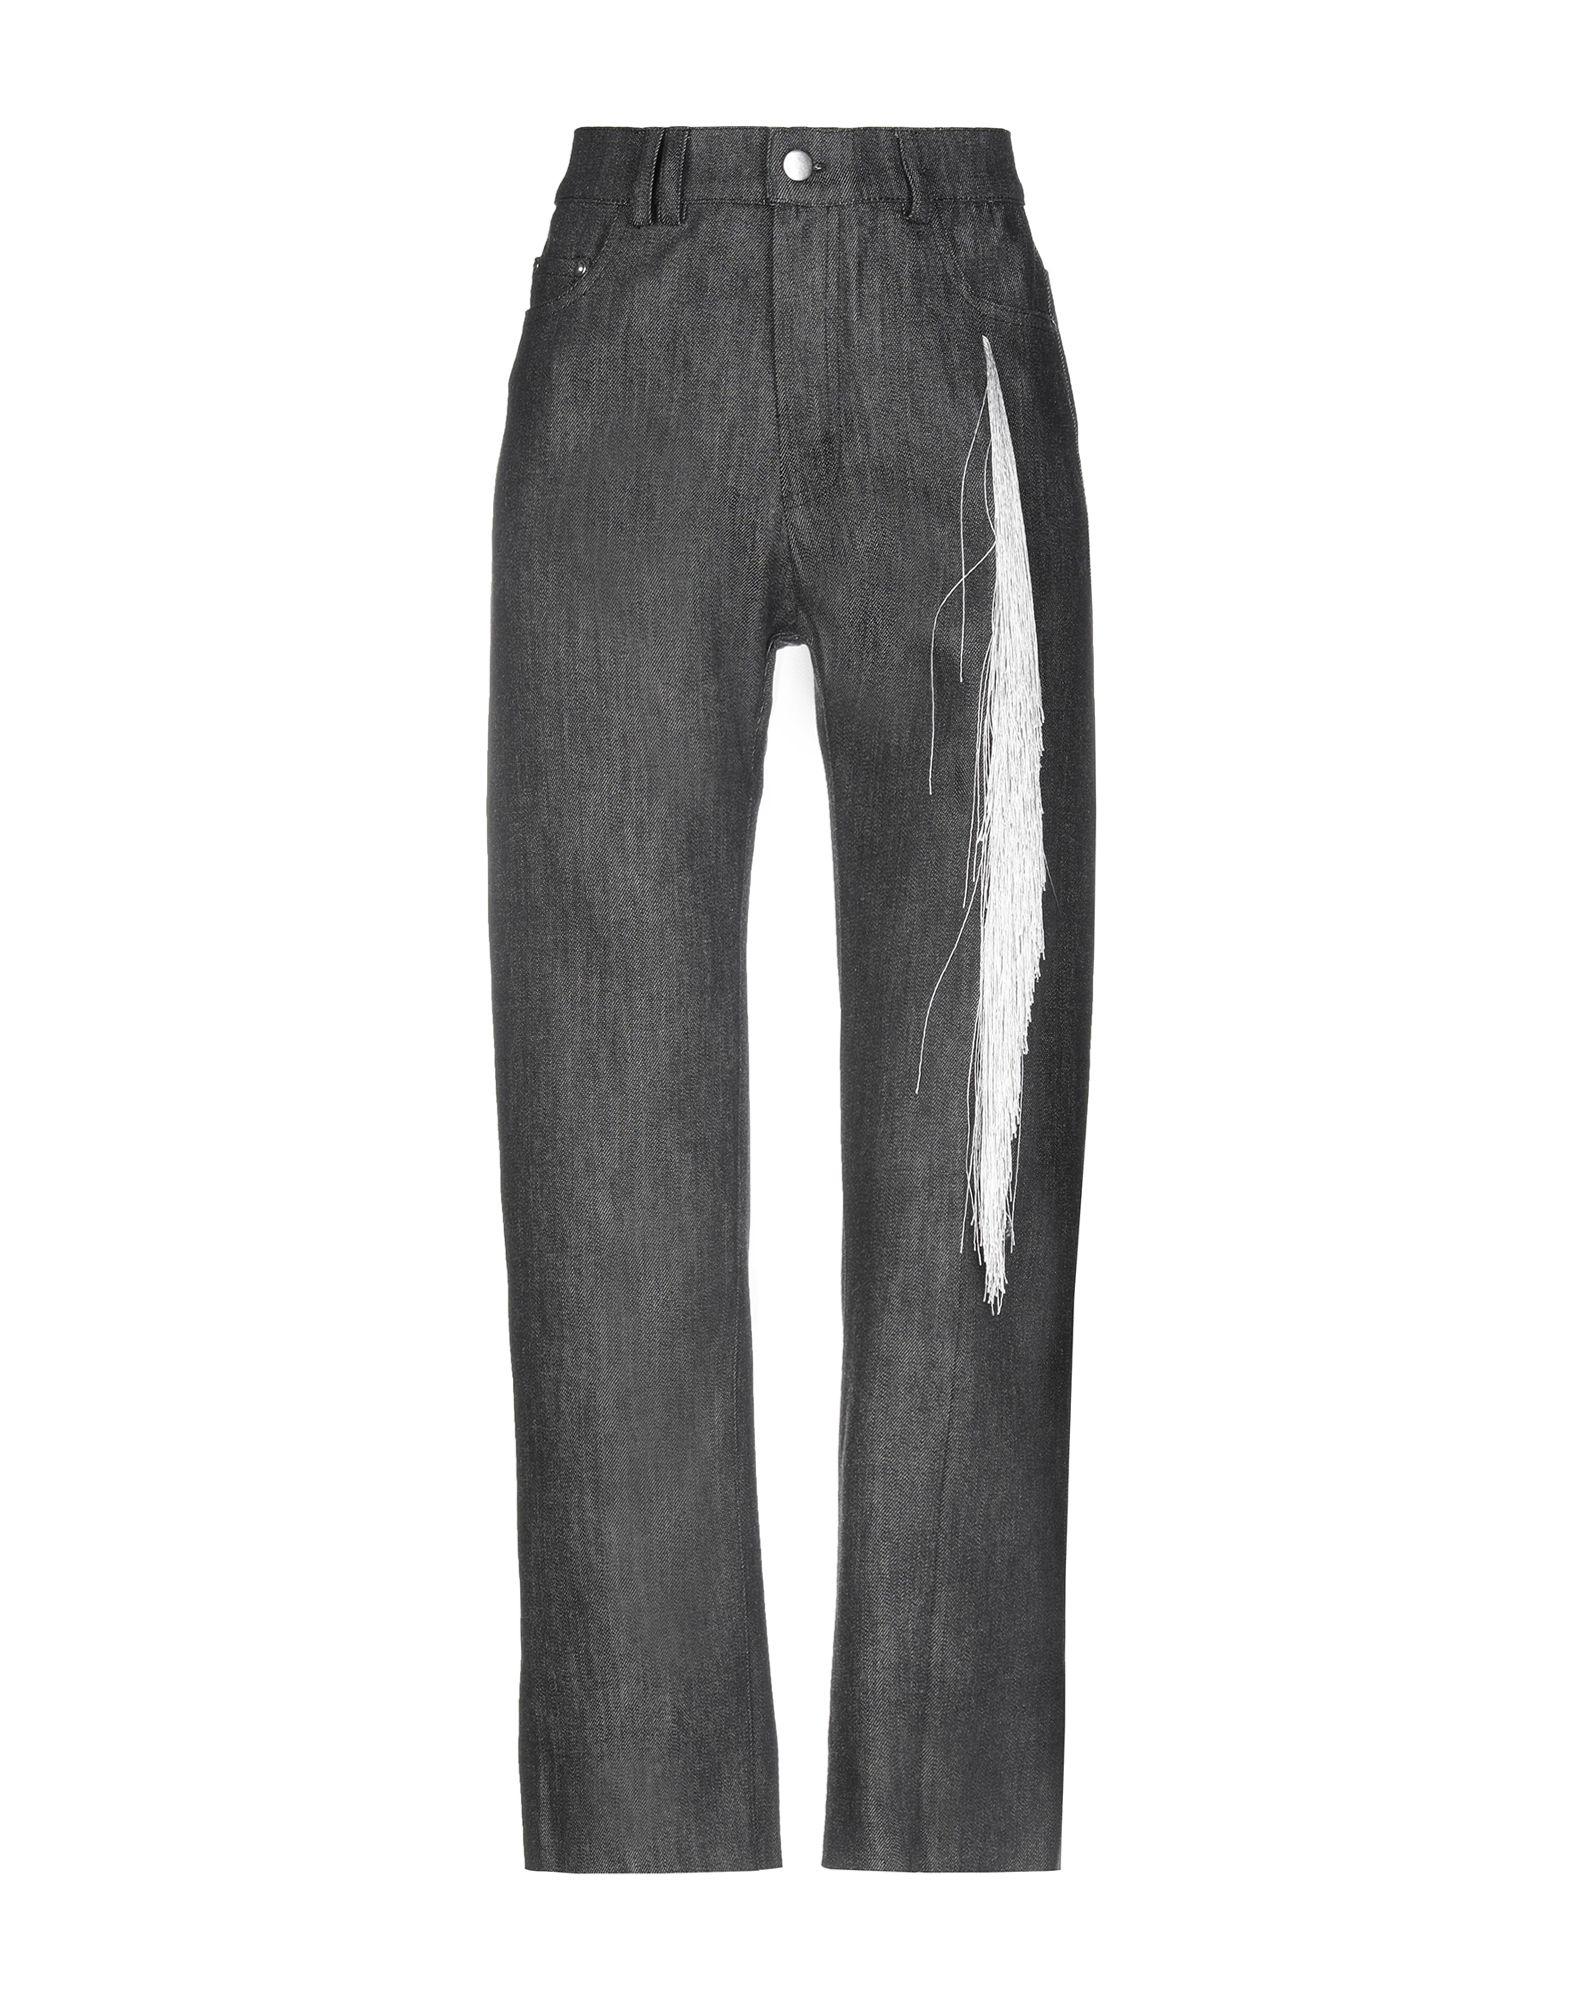 Pantaloni Jeans Act N°1 donna - 42698330RB 42698330RB  hier hat das neuste